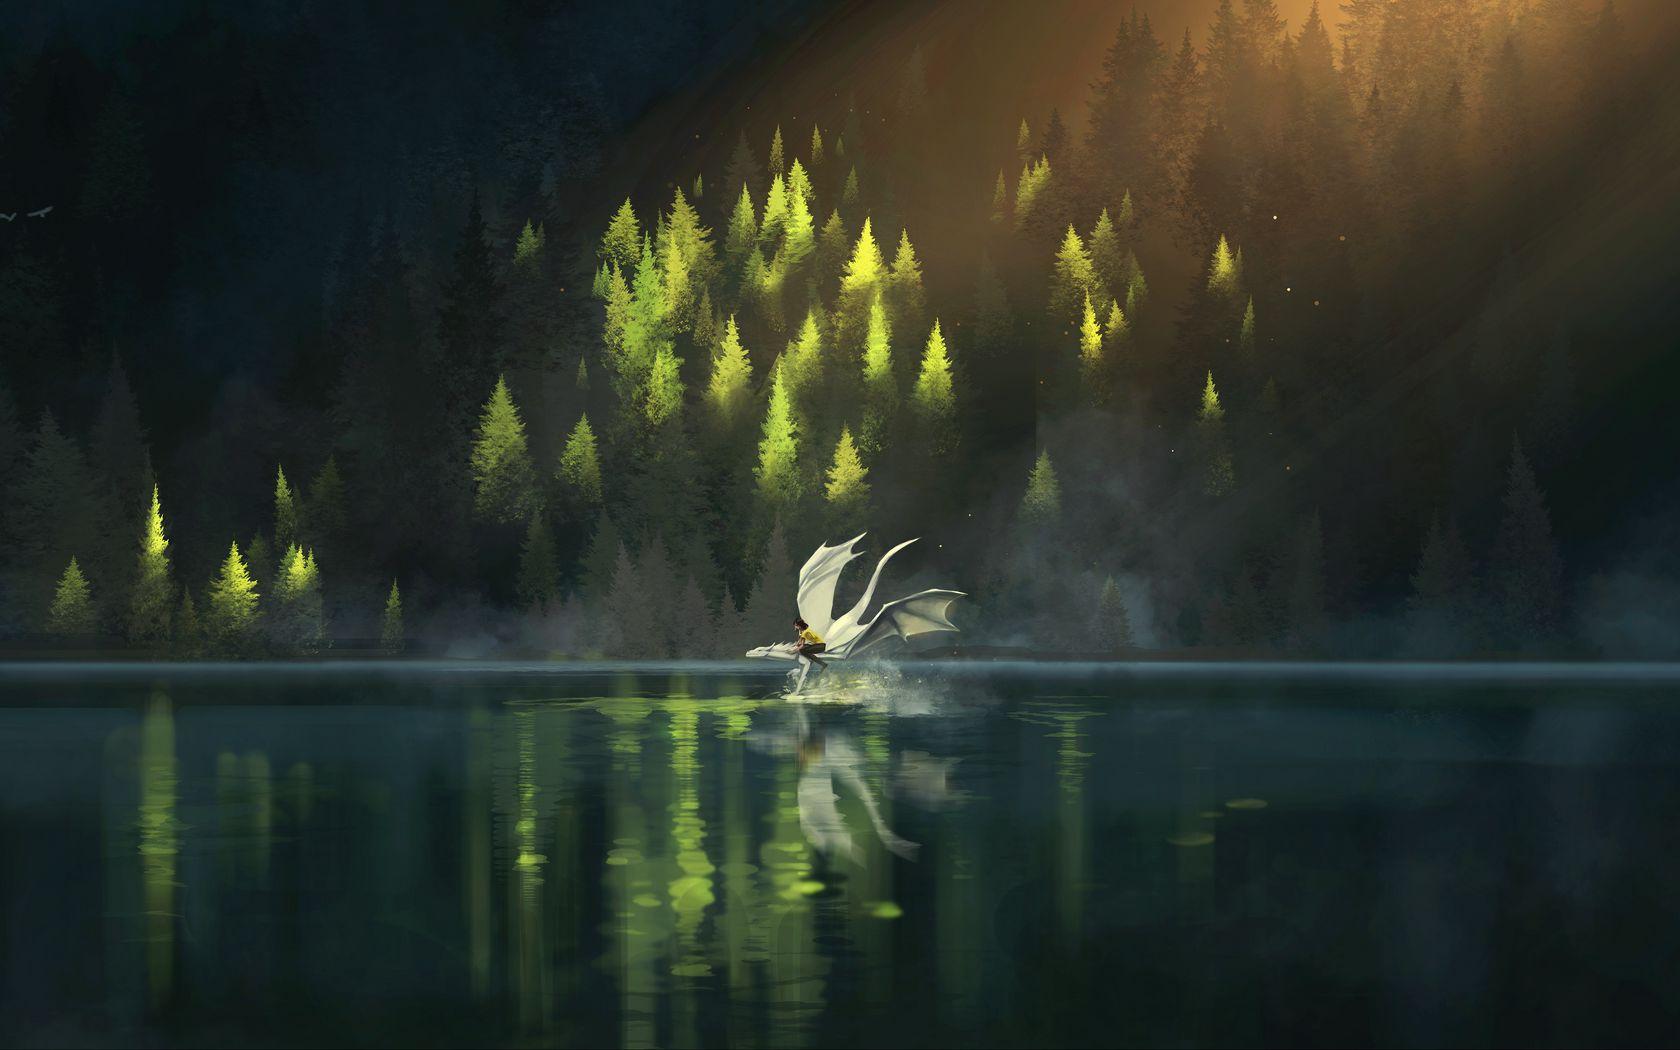 1680x1050 Wallpaper dragon, friends, fantasy, art